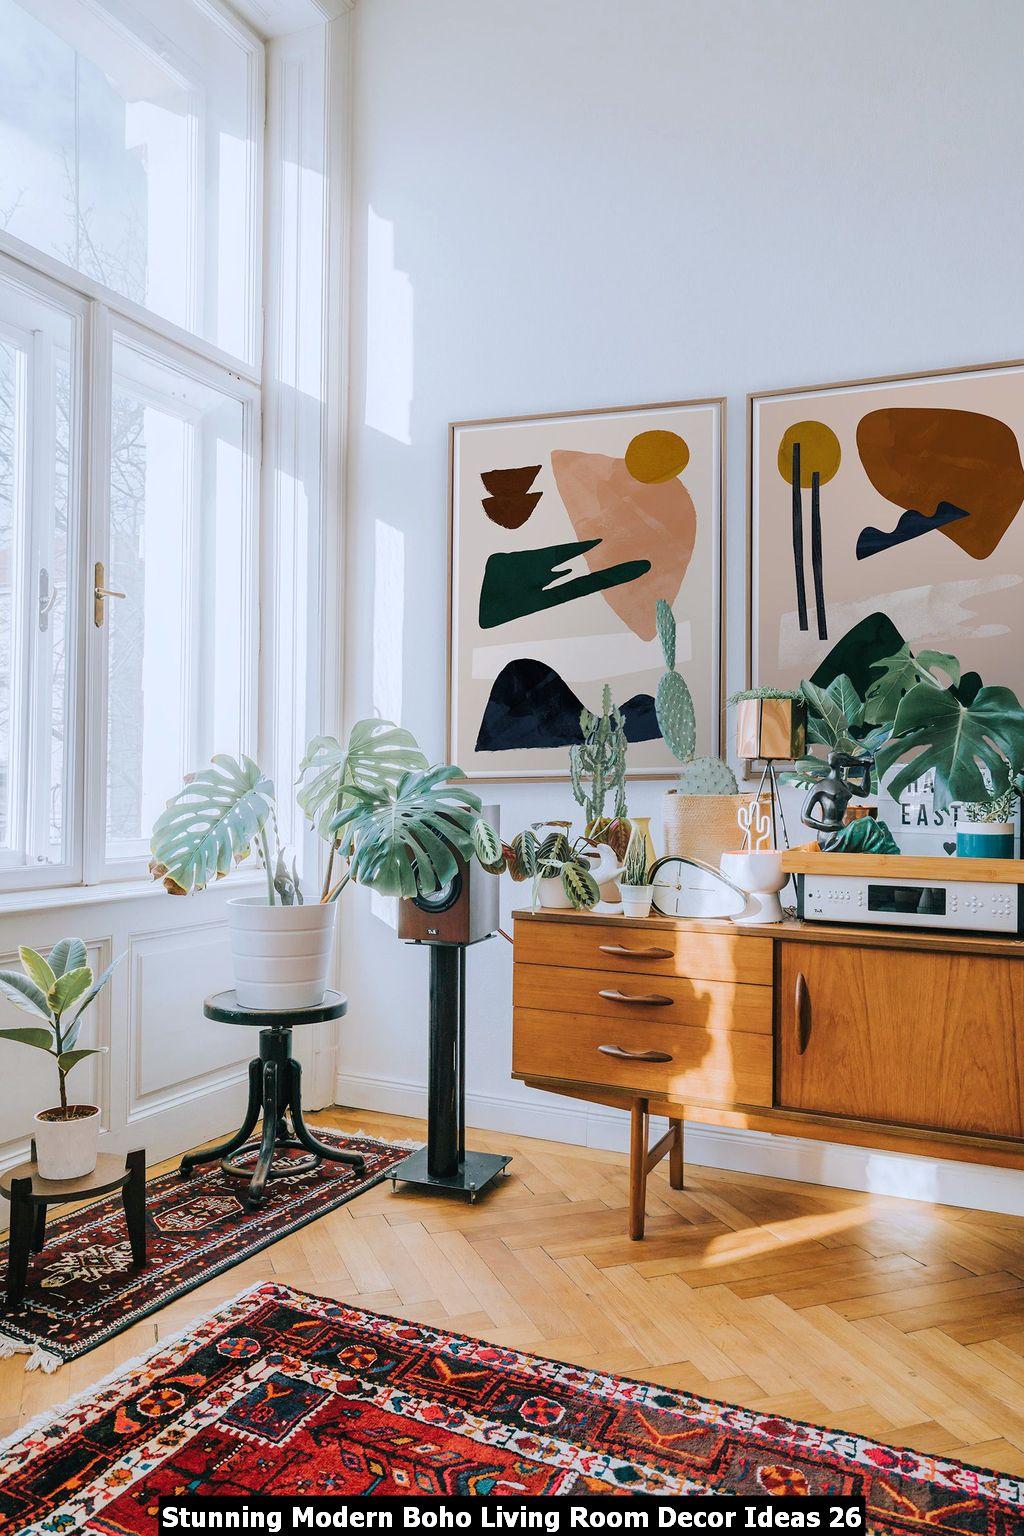 Stunning Modern Boho Living Room Decor Ideas 26